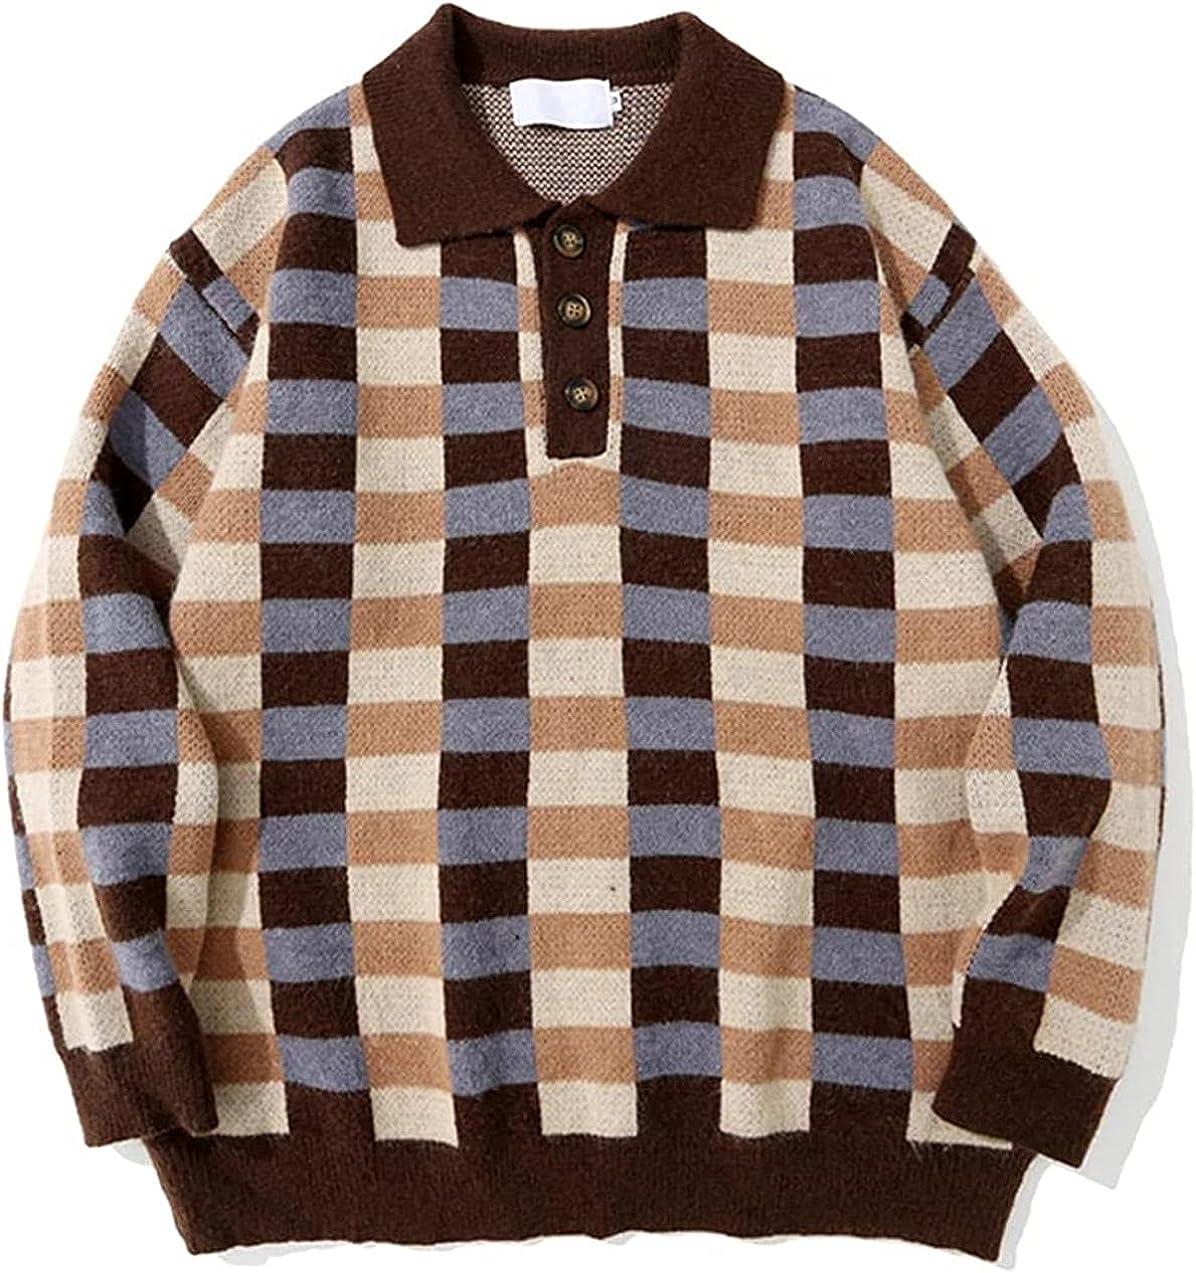 Men Sweater Streetwear Autumn Winter Casual Pullover Tops Hip Hop Plaid Lapel Sweater